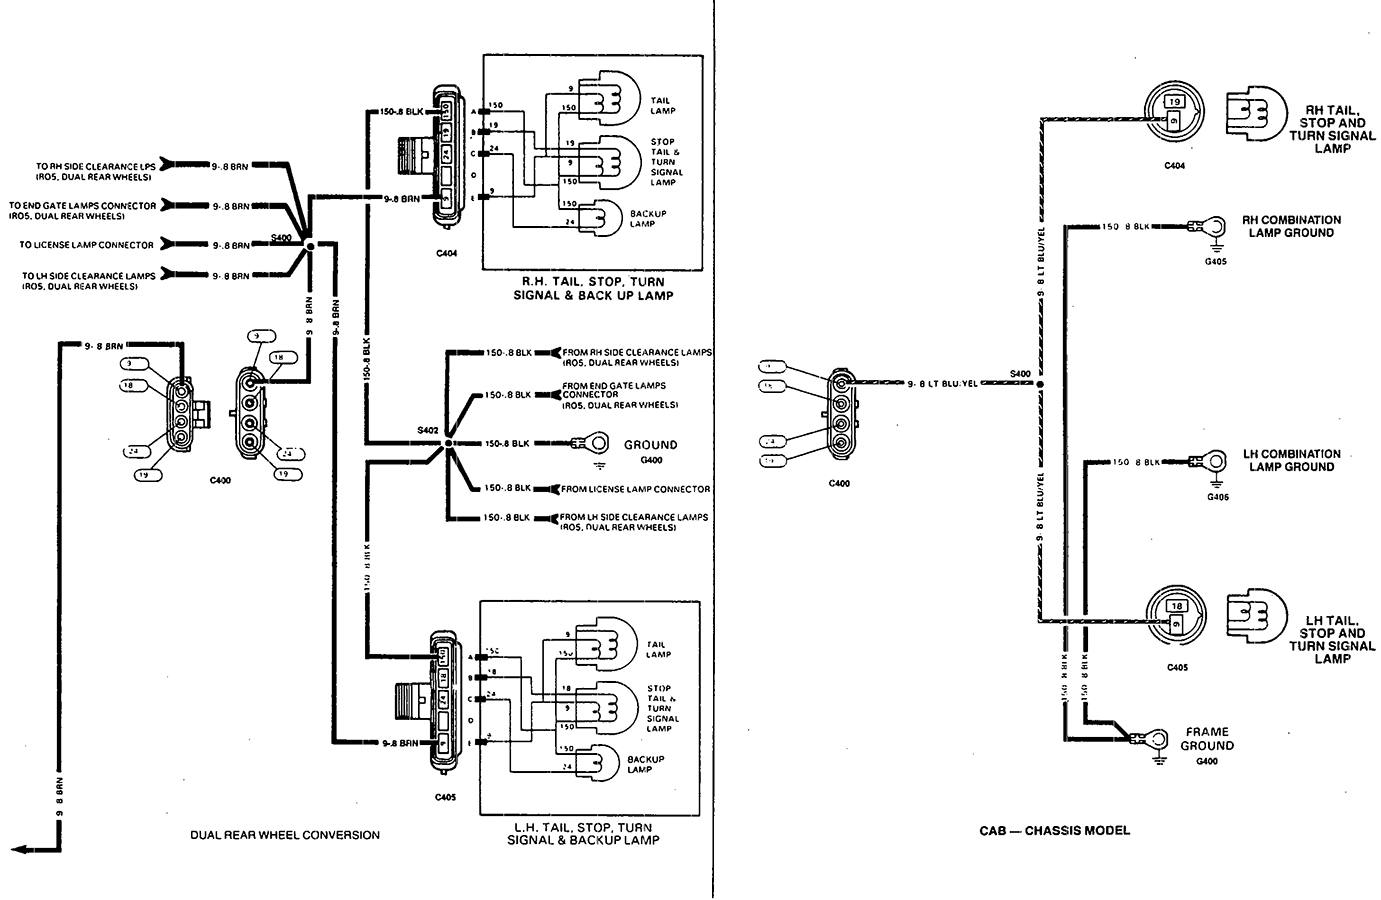 Chevy Truck Backup Light Wiring   Wiring Diagram - Reverse Light Wiring Diagram